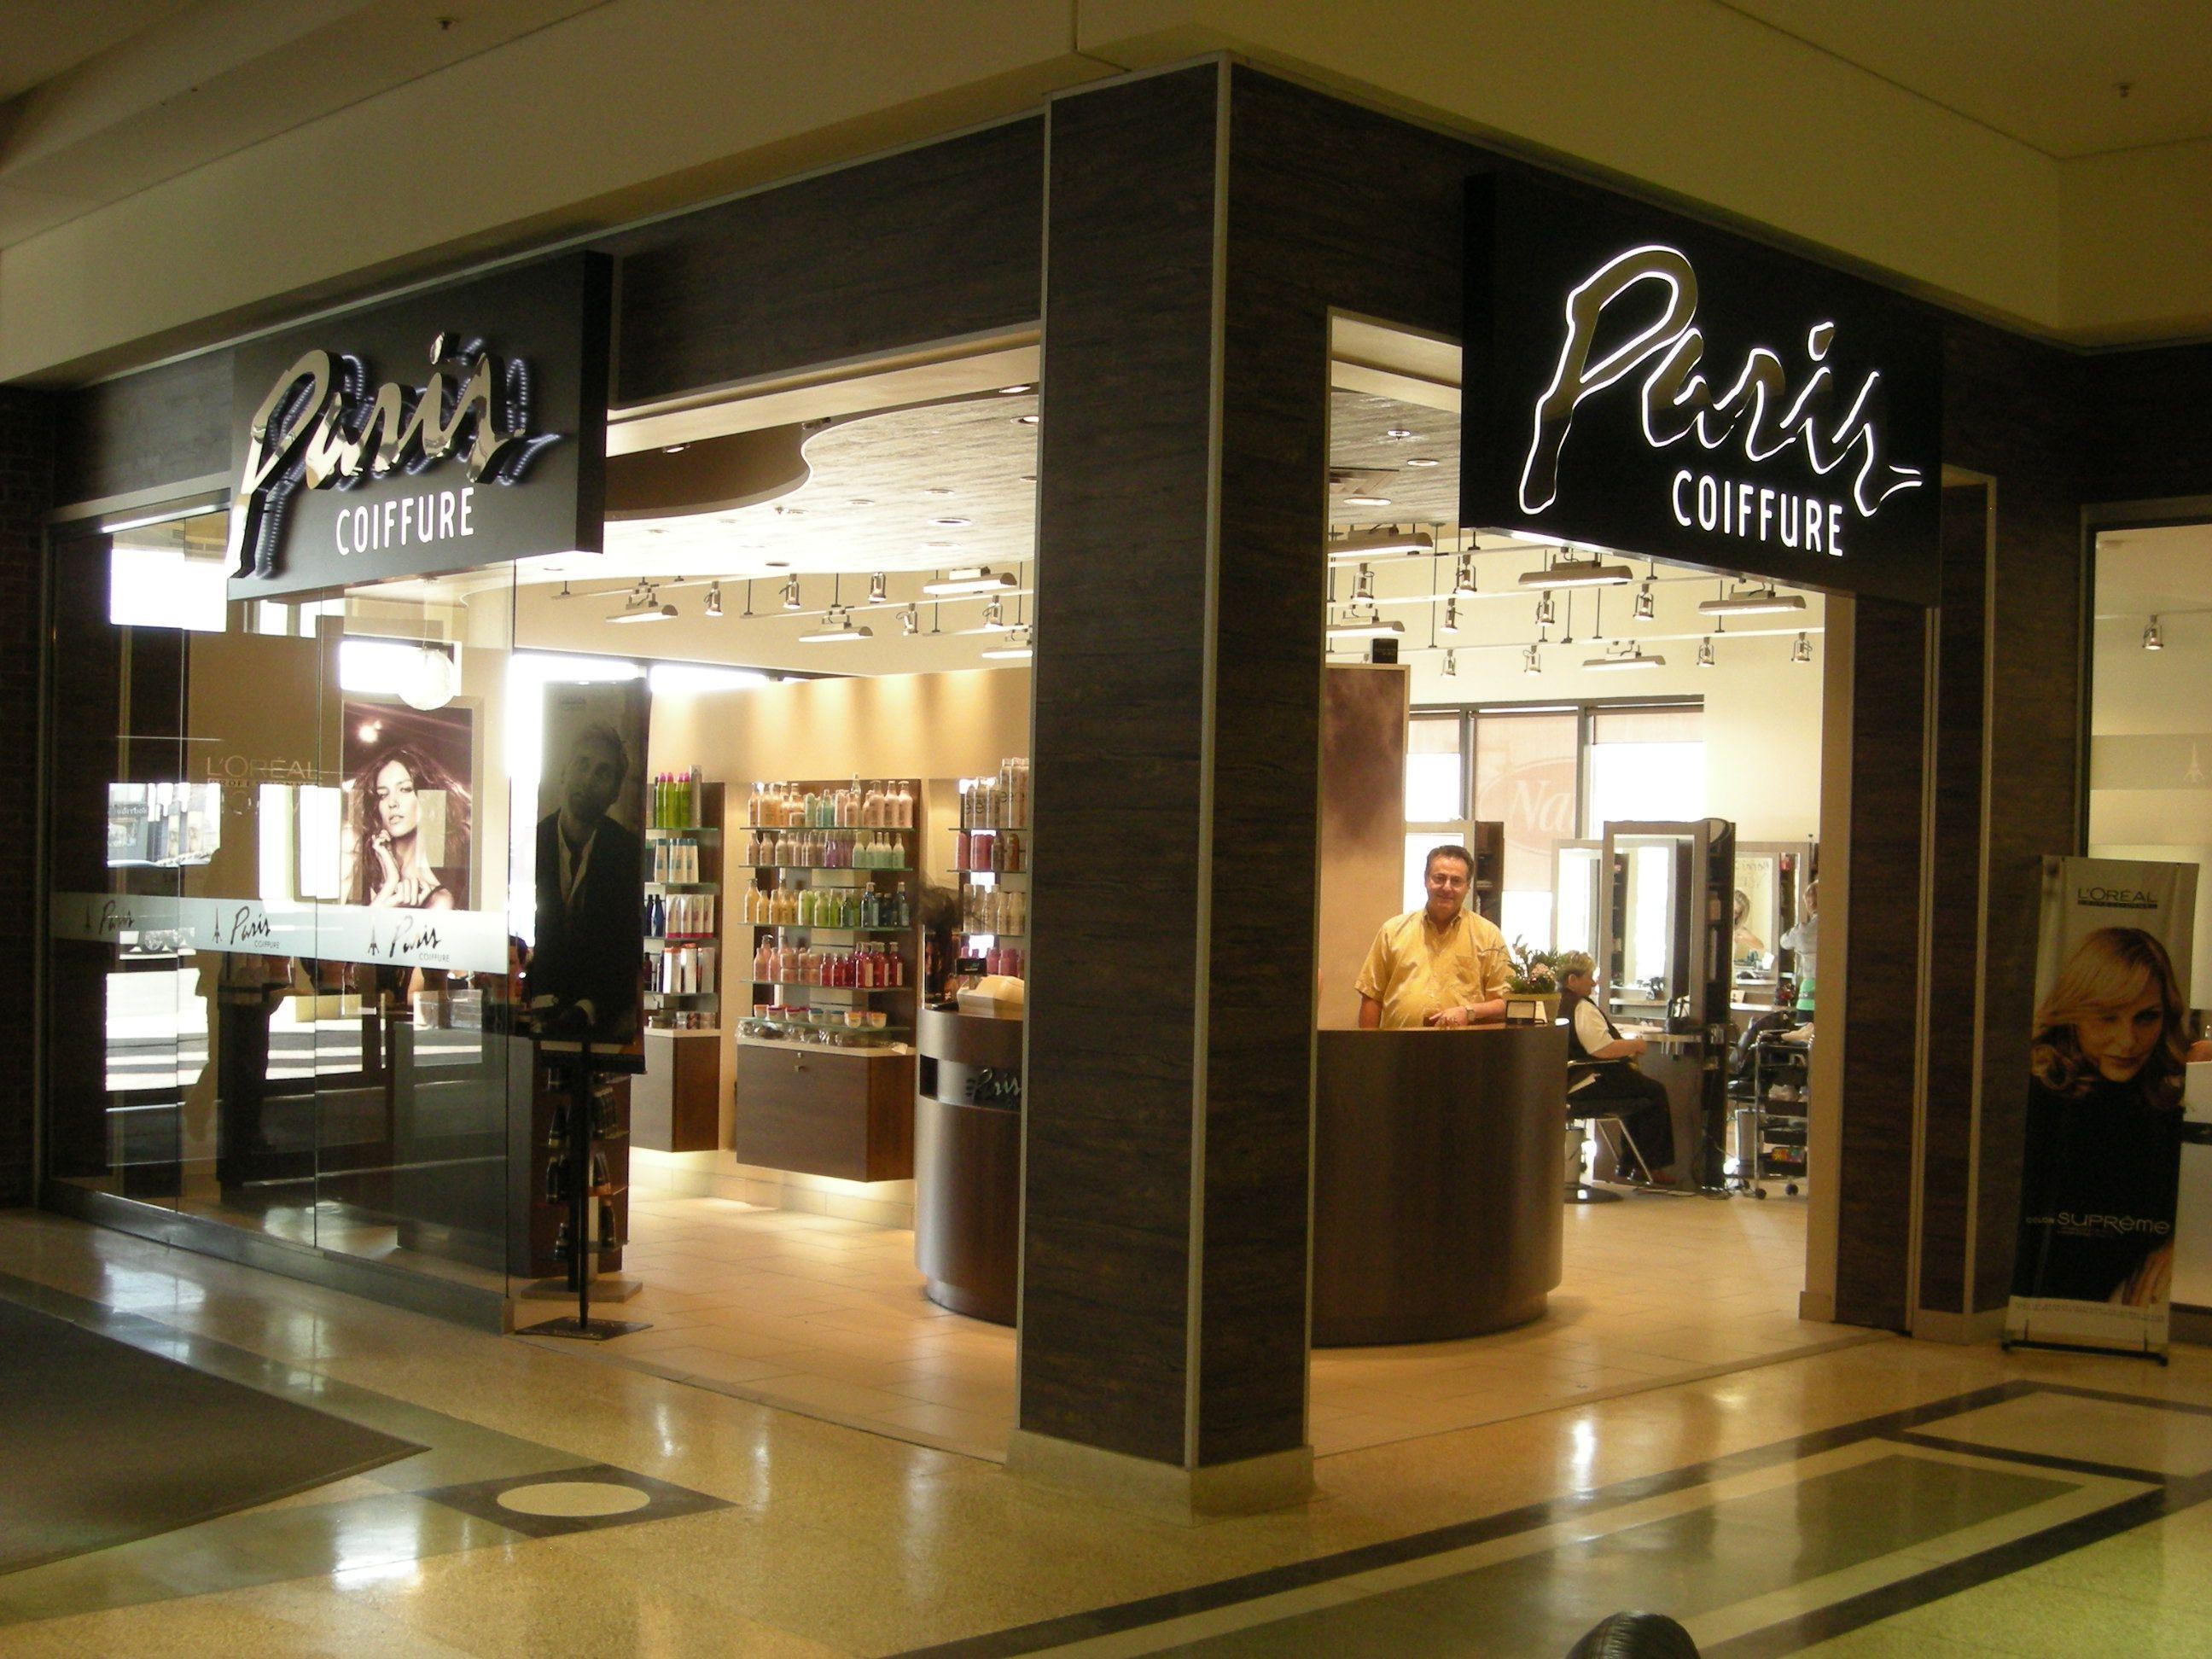 Paris Coiffure Boutique